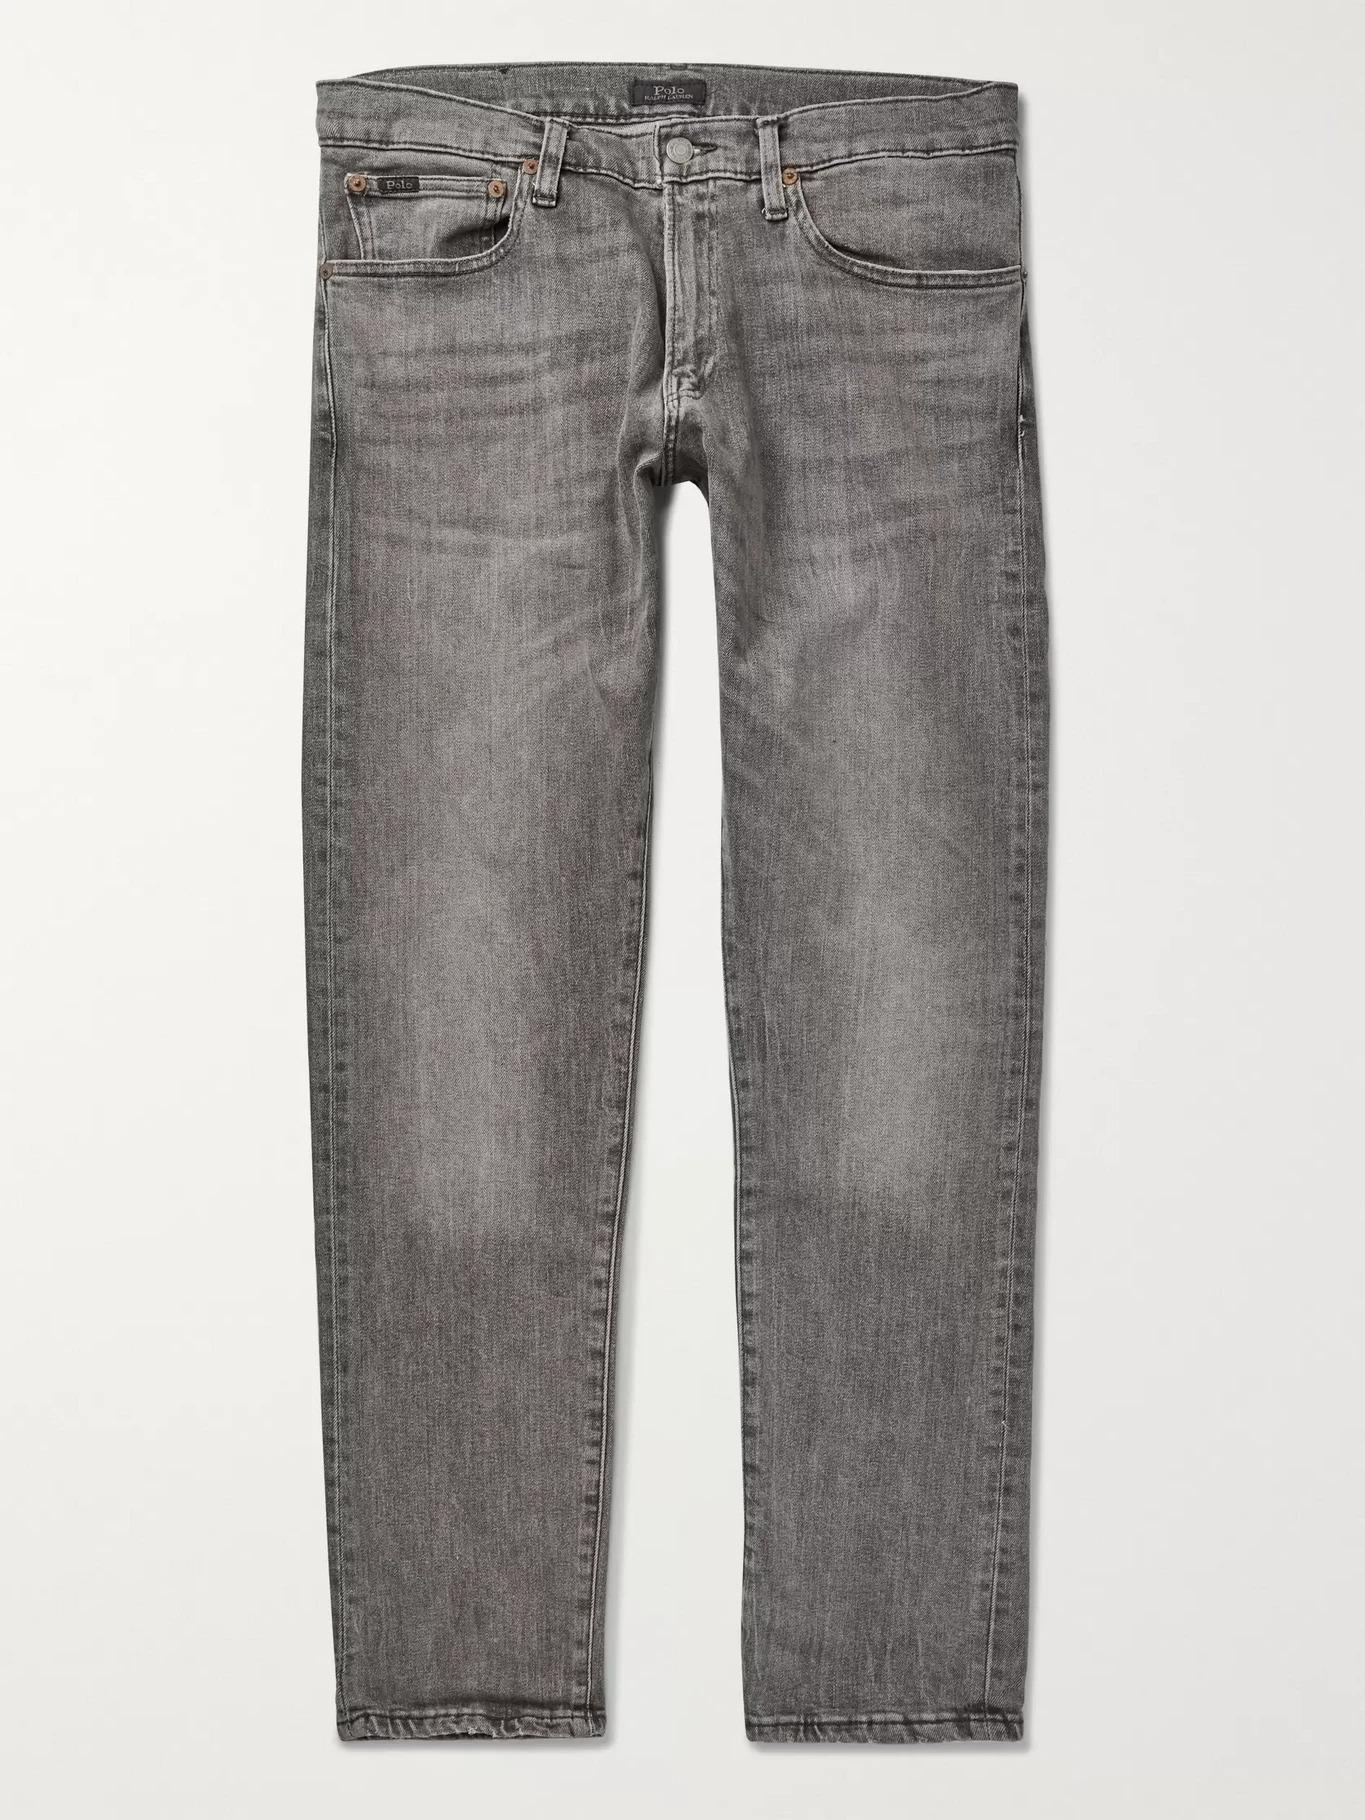 Polo Ralph Lauren Warren Slim-Fit Stretch-Denim Jeans, designer jeans for men